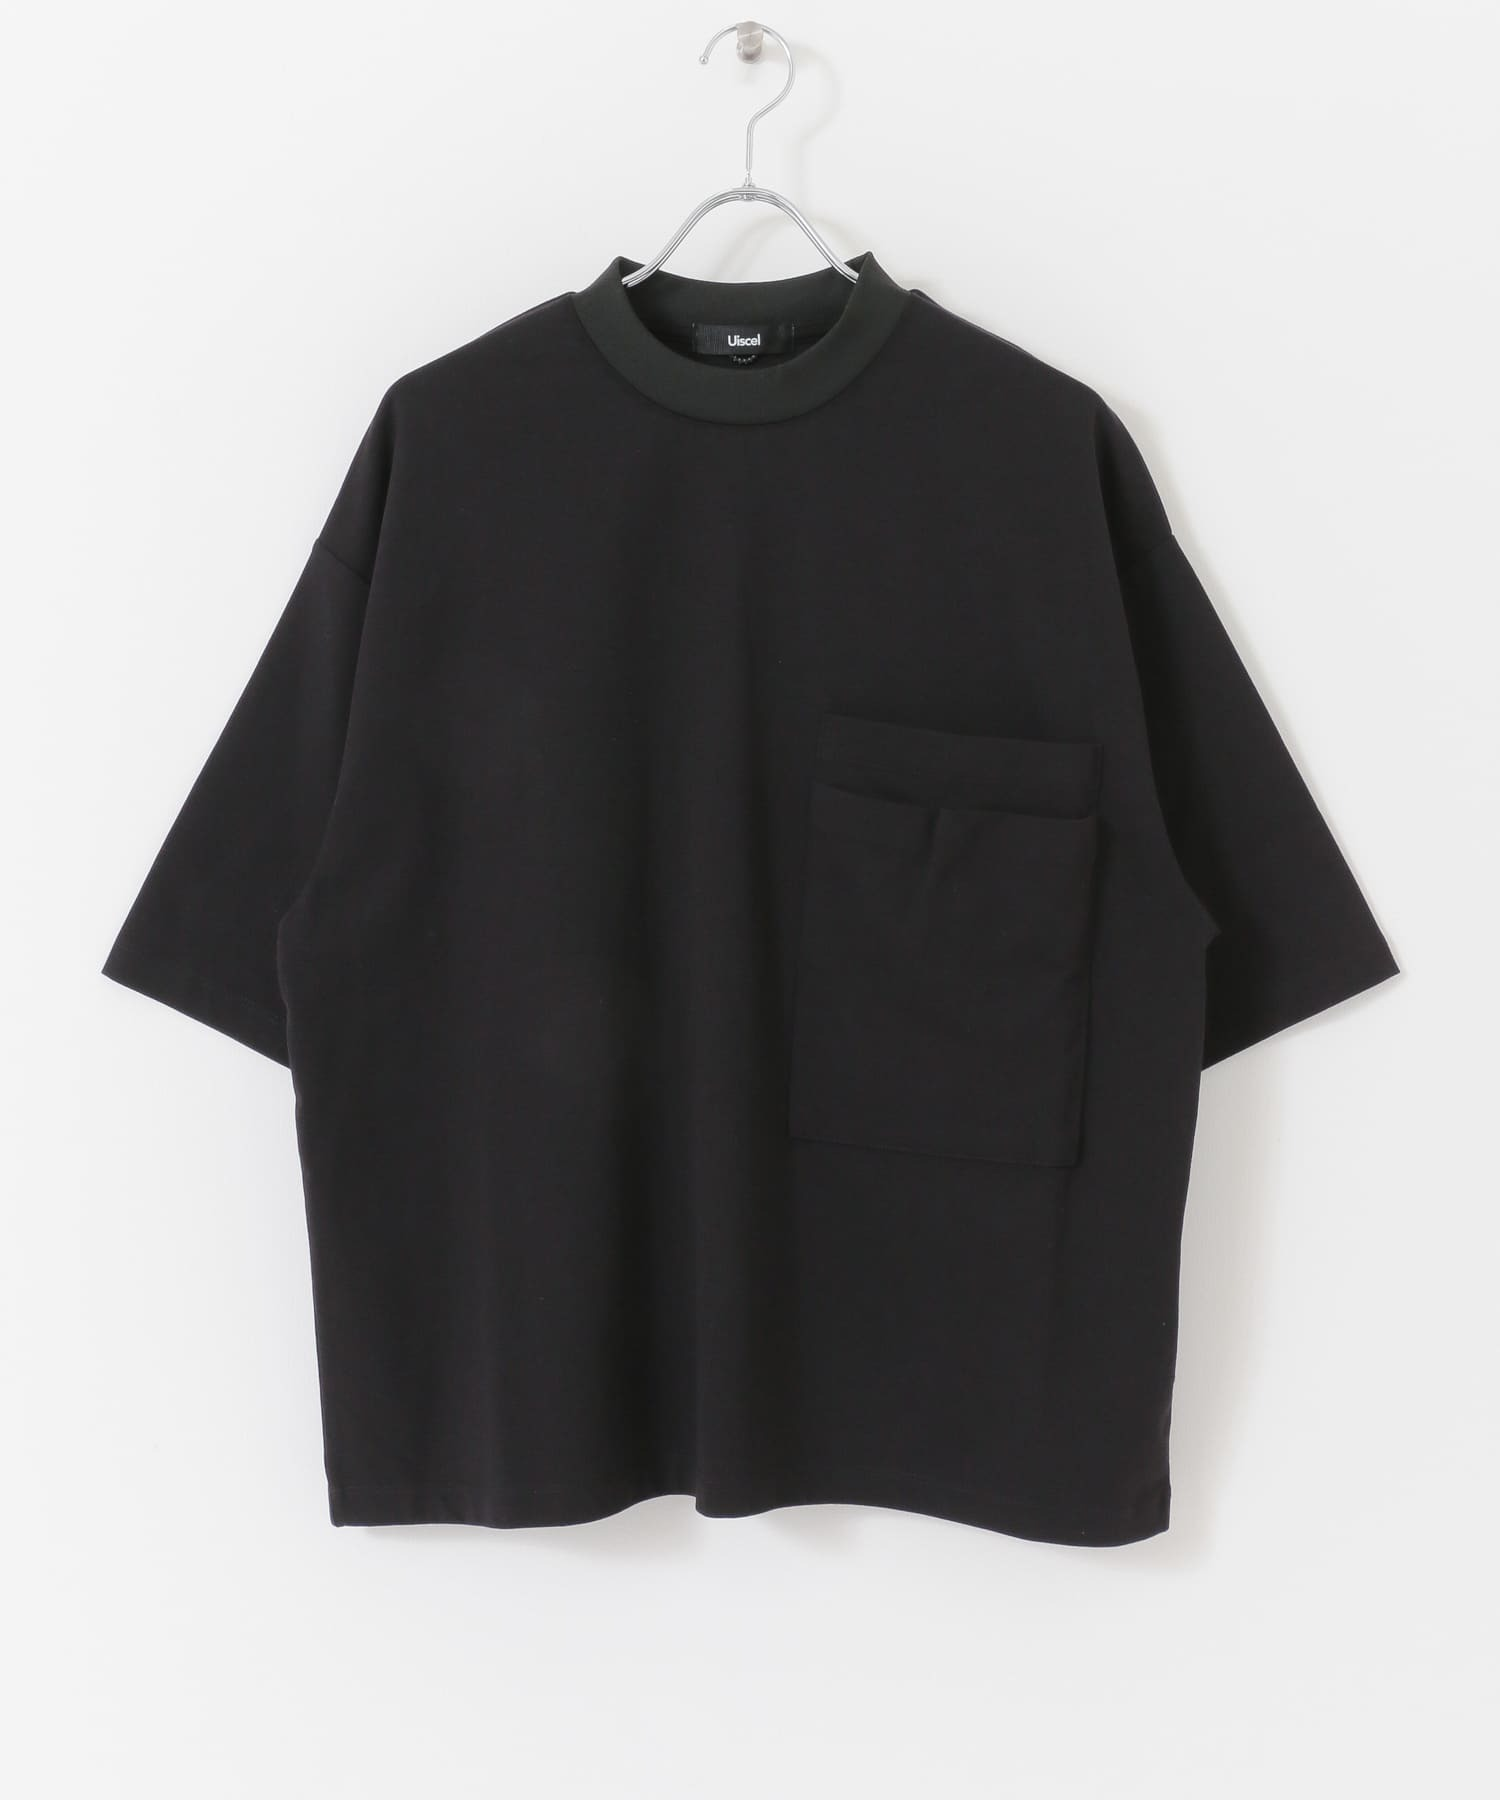 Uiscel 大口袋寬鬆上衣 (5分袖)